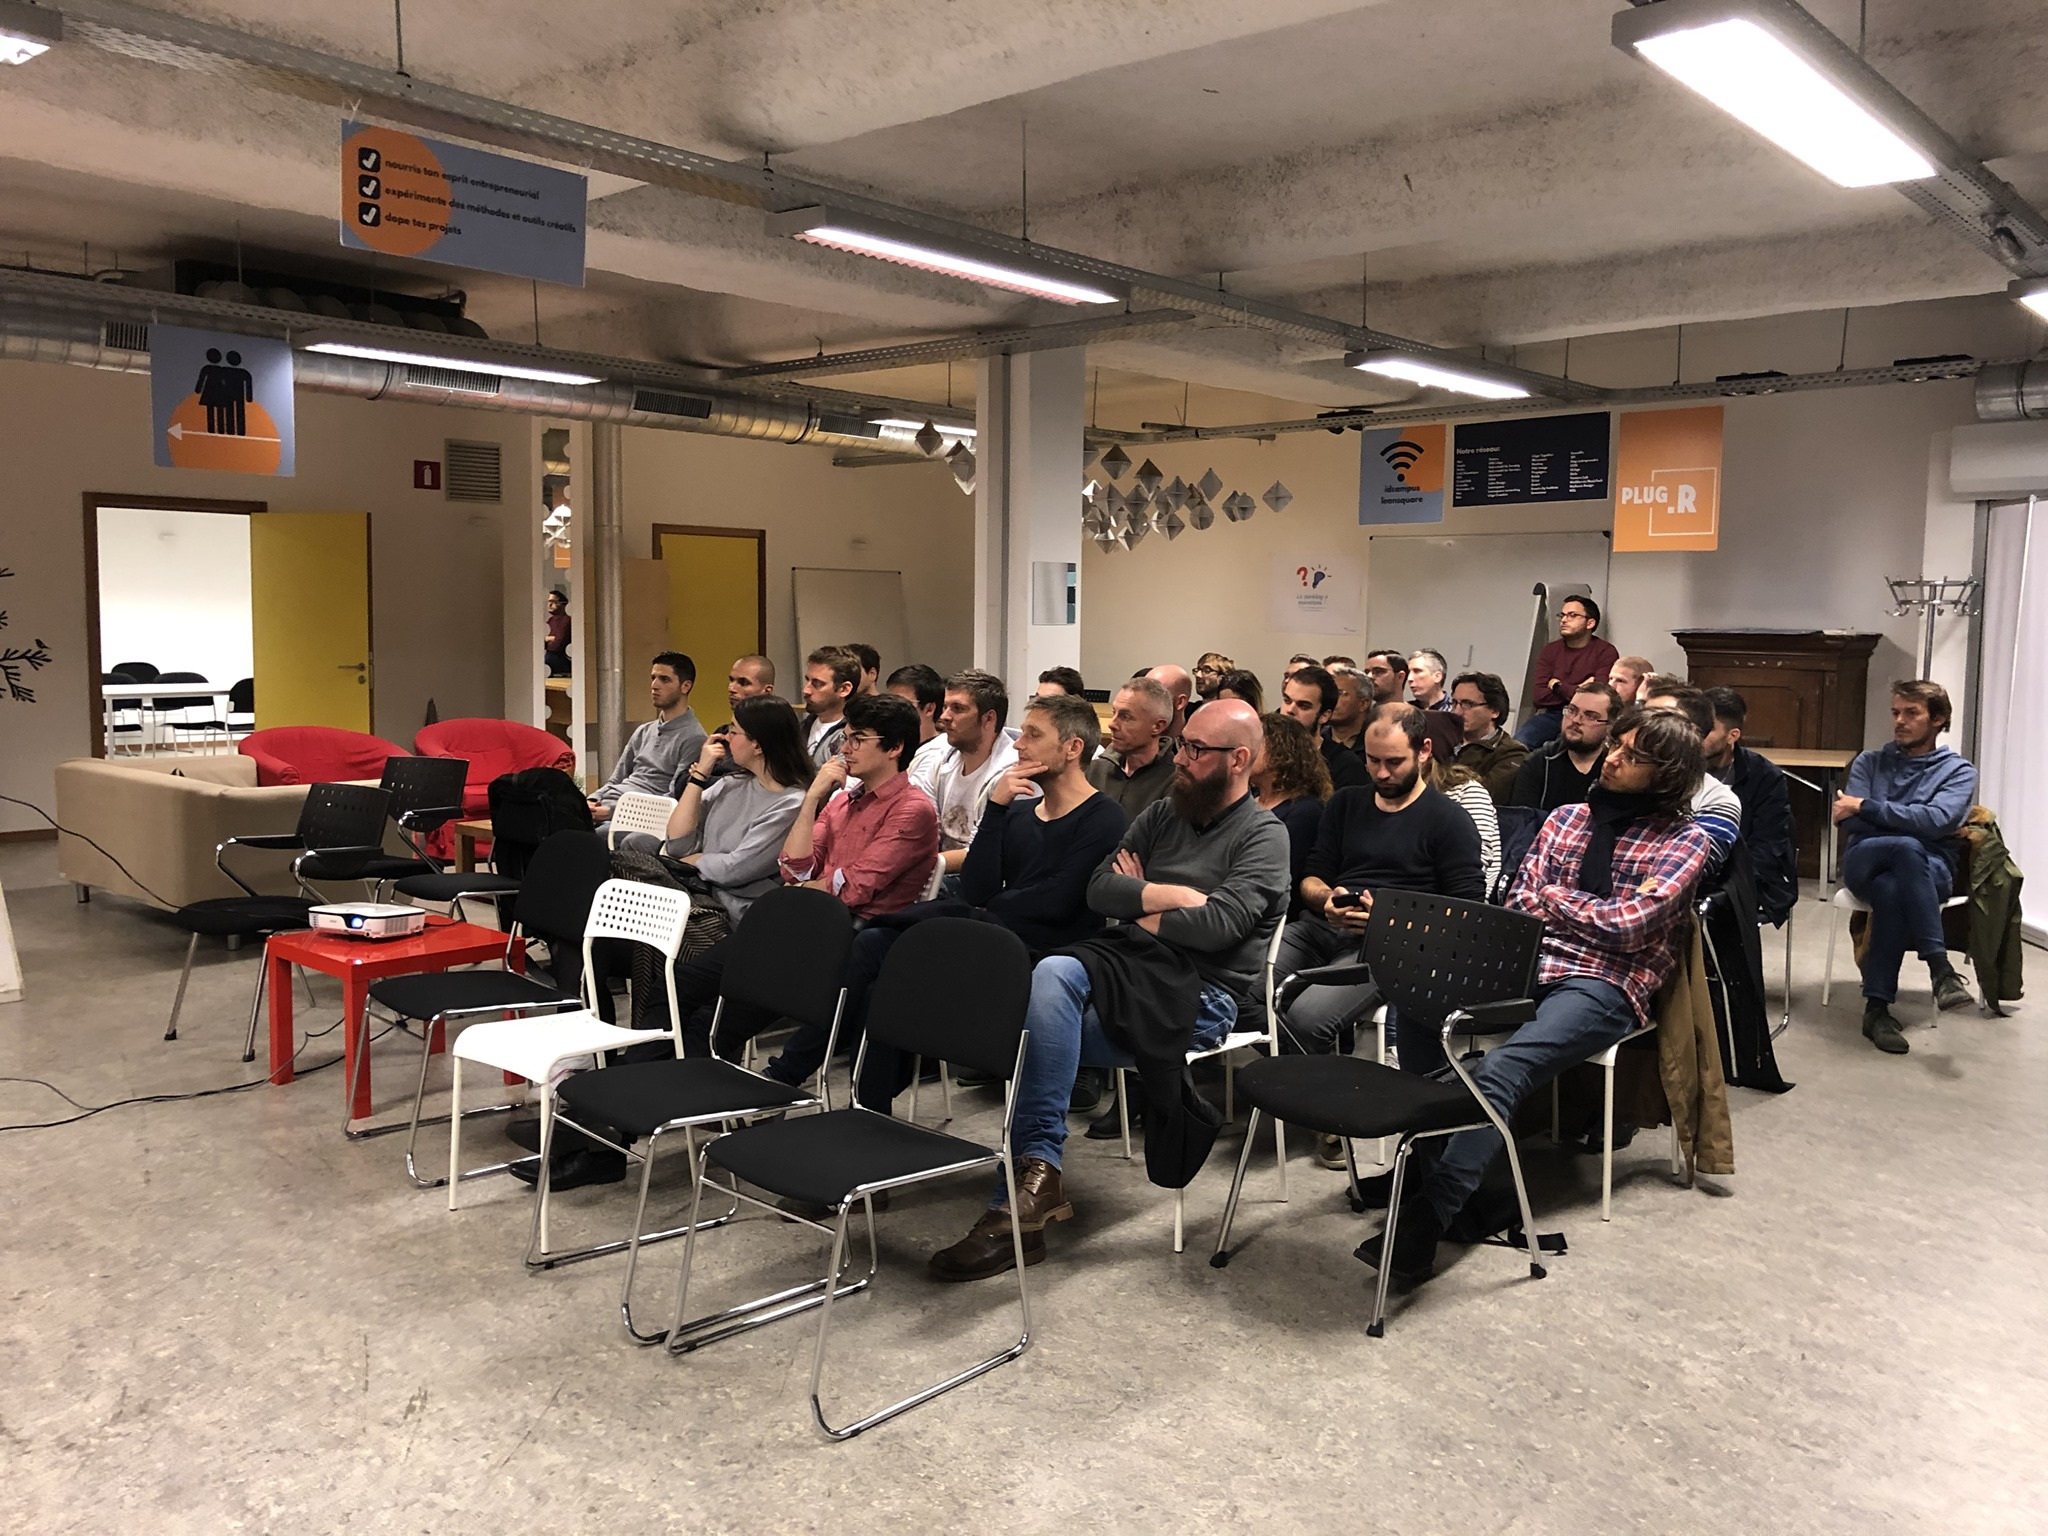 Retour du Meetup Liège WordPress, quand Namur bouge à Liège :)